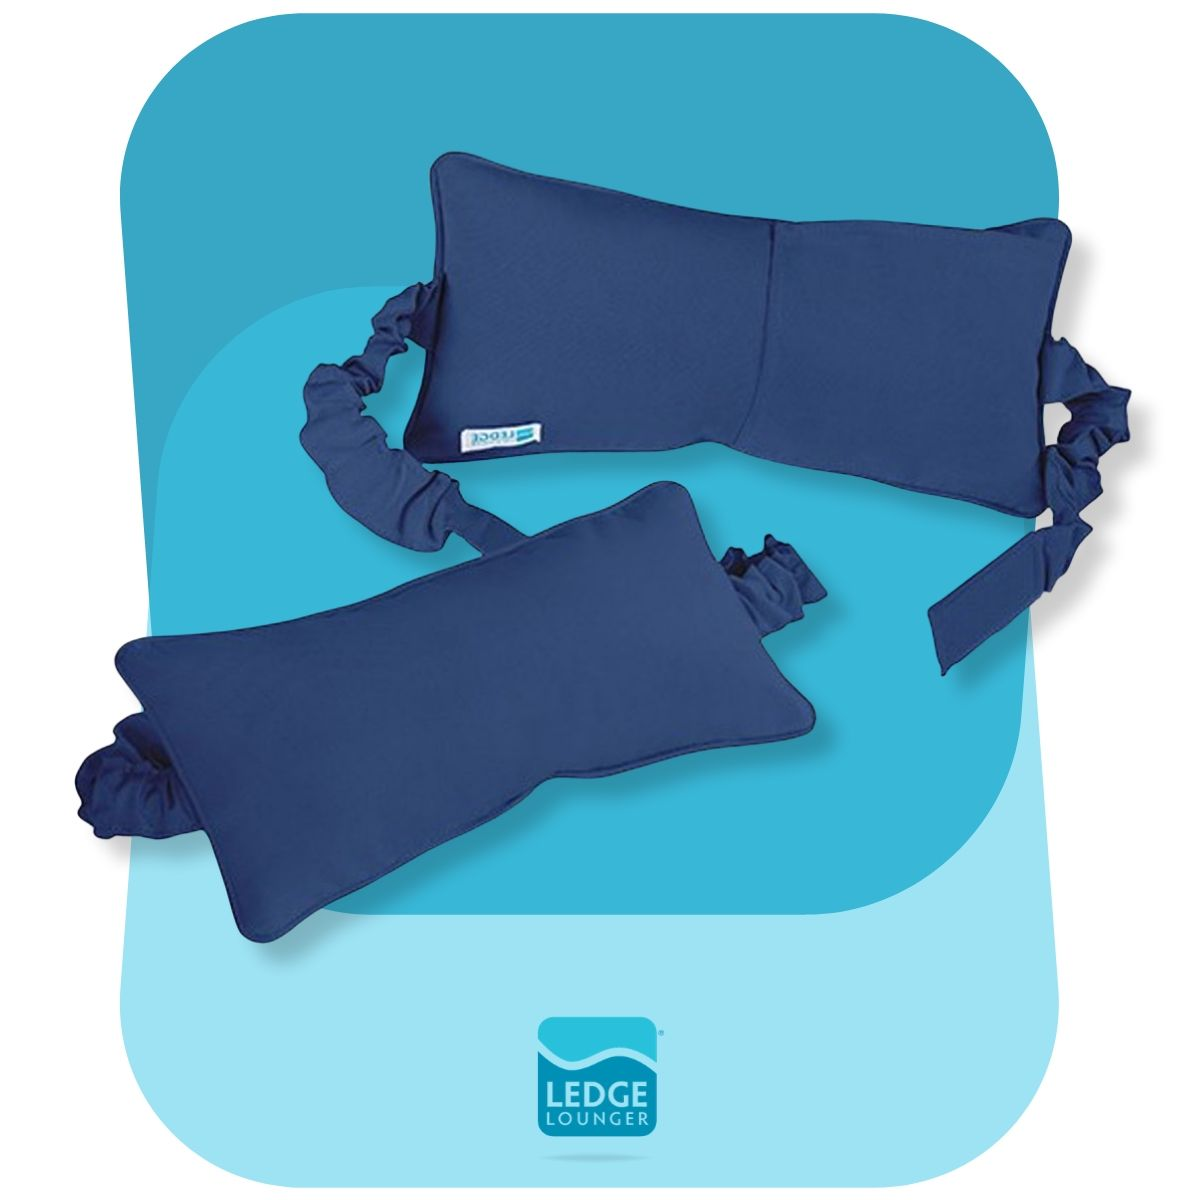 ledge-lounger-headrest-pillow